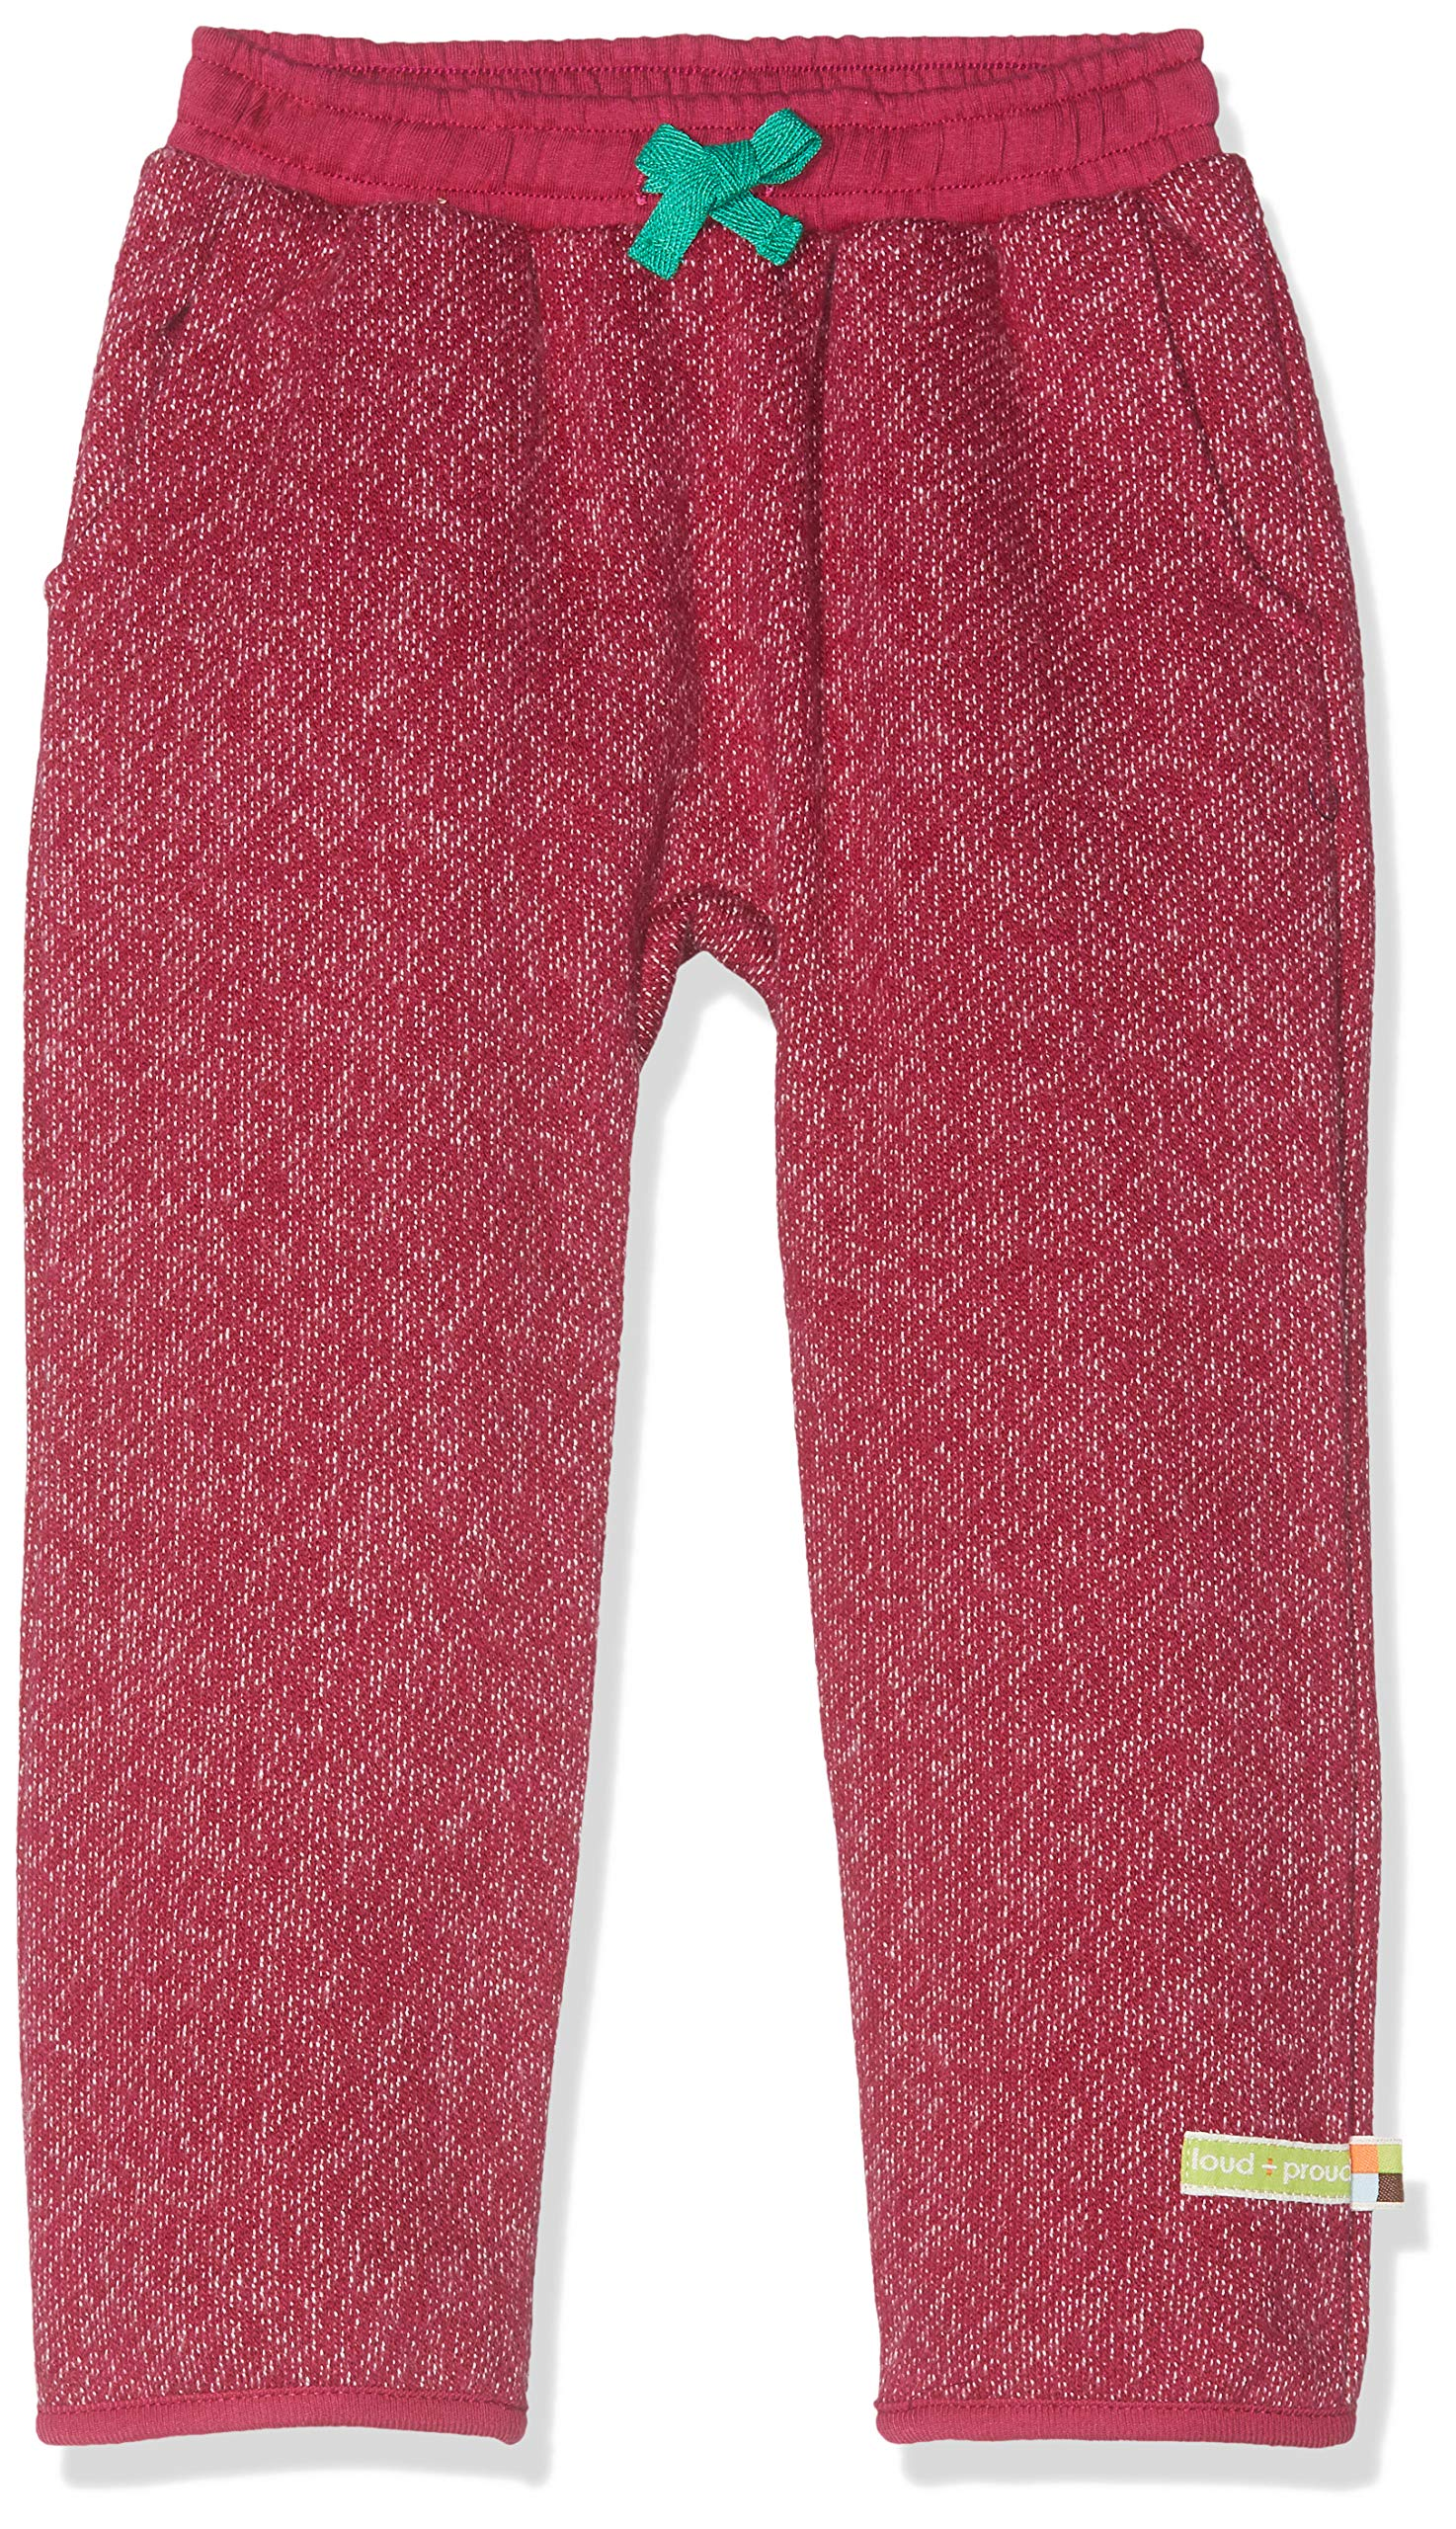 loud + proud Hose In Melange Strick Aus Bio Baumwolle, Gots Zertifiziert Pantalones para Bebés 1